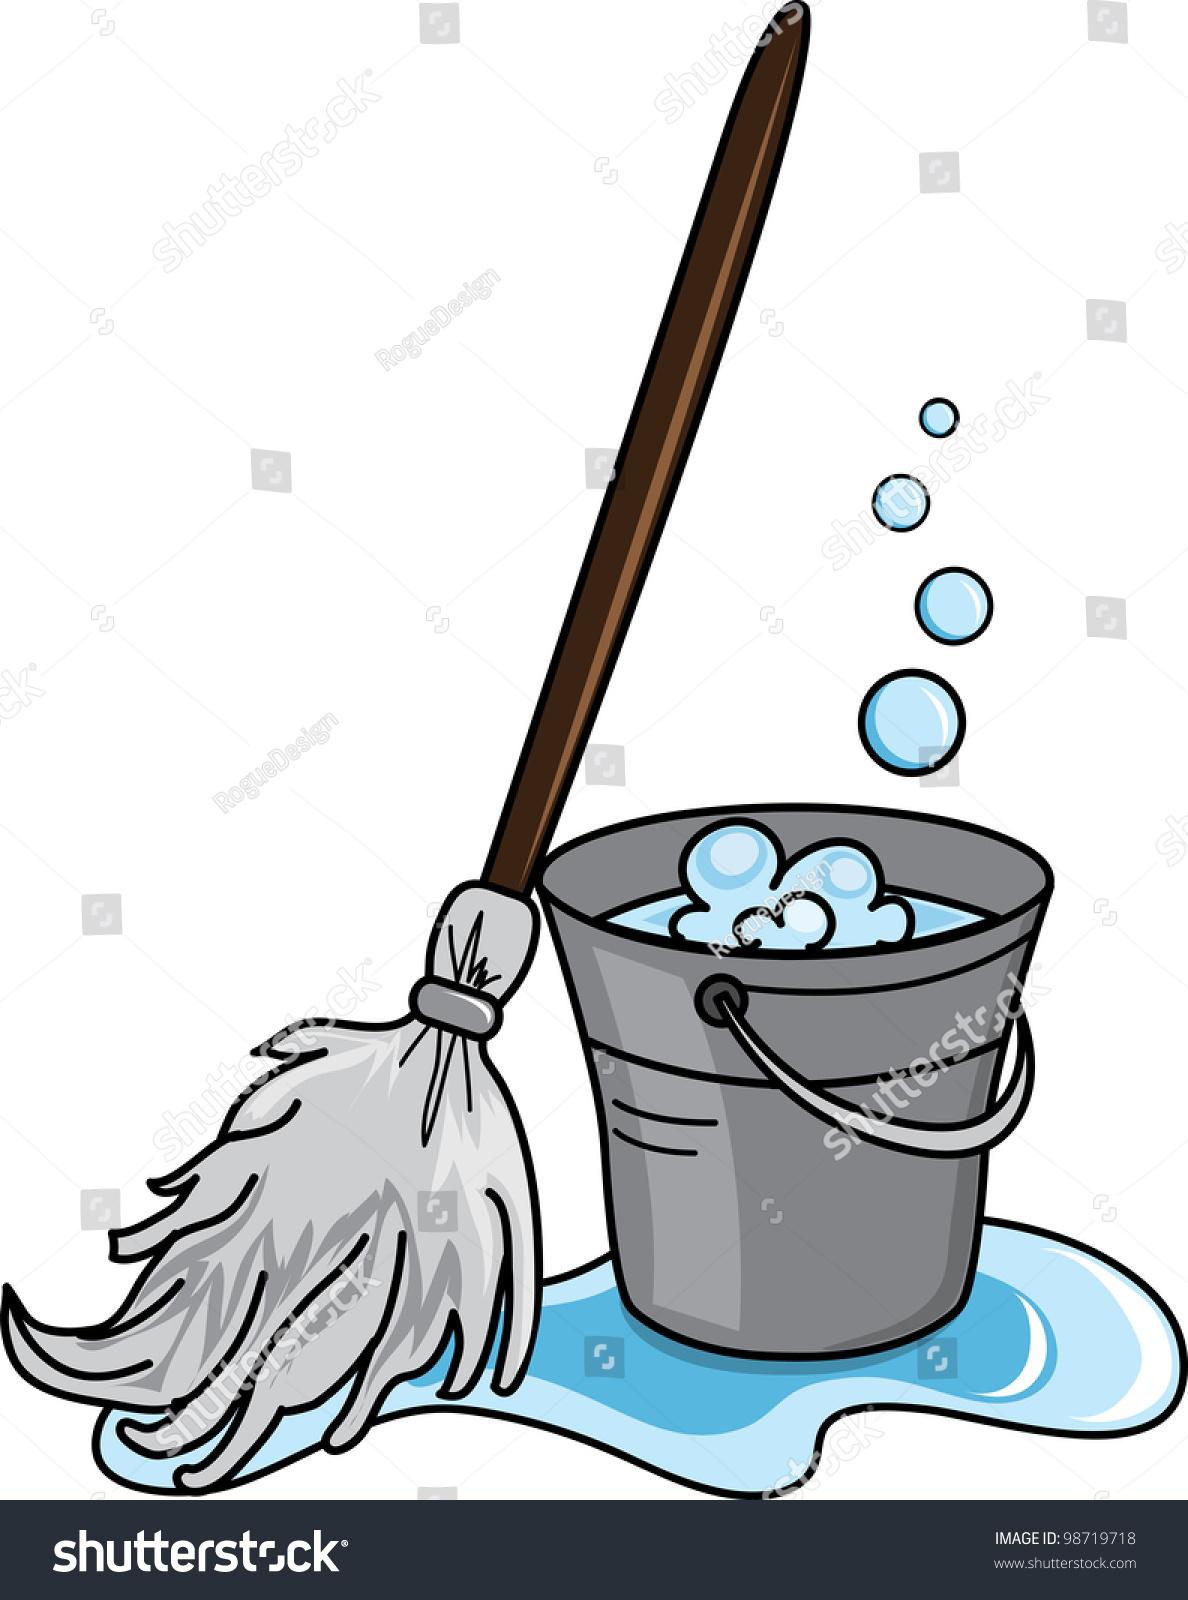 clip art illustration cleaning bucket filled stock illustration rh shutterstock com clip art cleaning crew clip art cleaning pictures